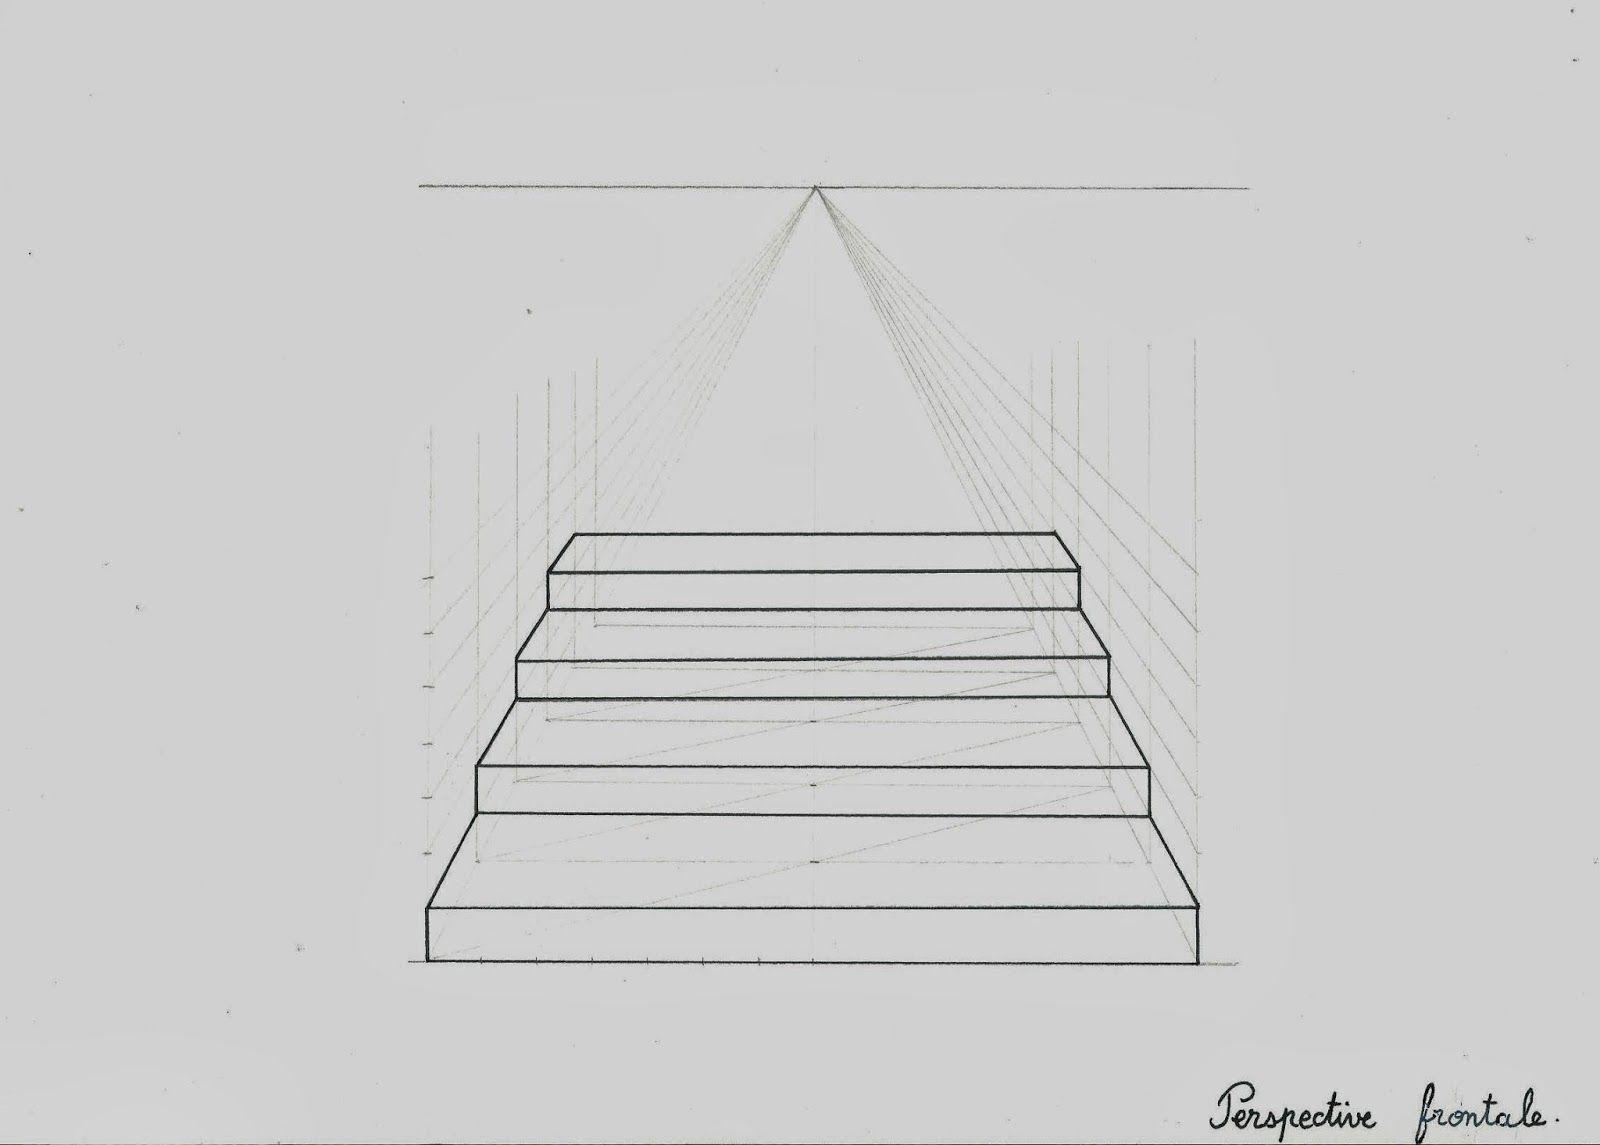 construire deux escaliers en perspective un escalier en perspective frontale un point de. Black Bedroom Furniture Sets. Home Design Ideas